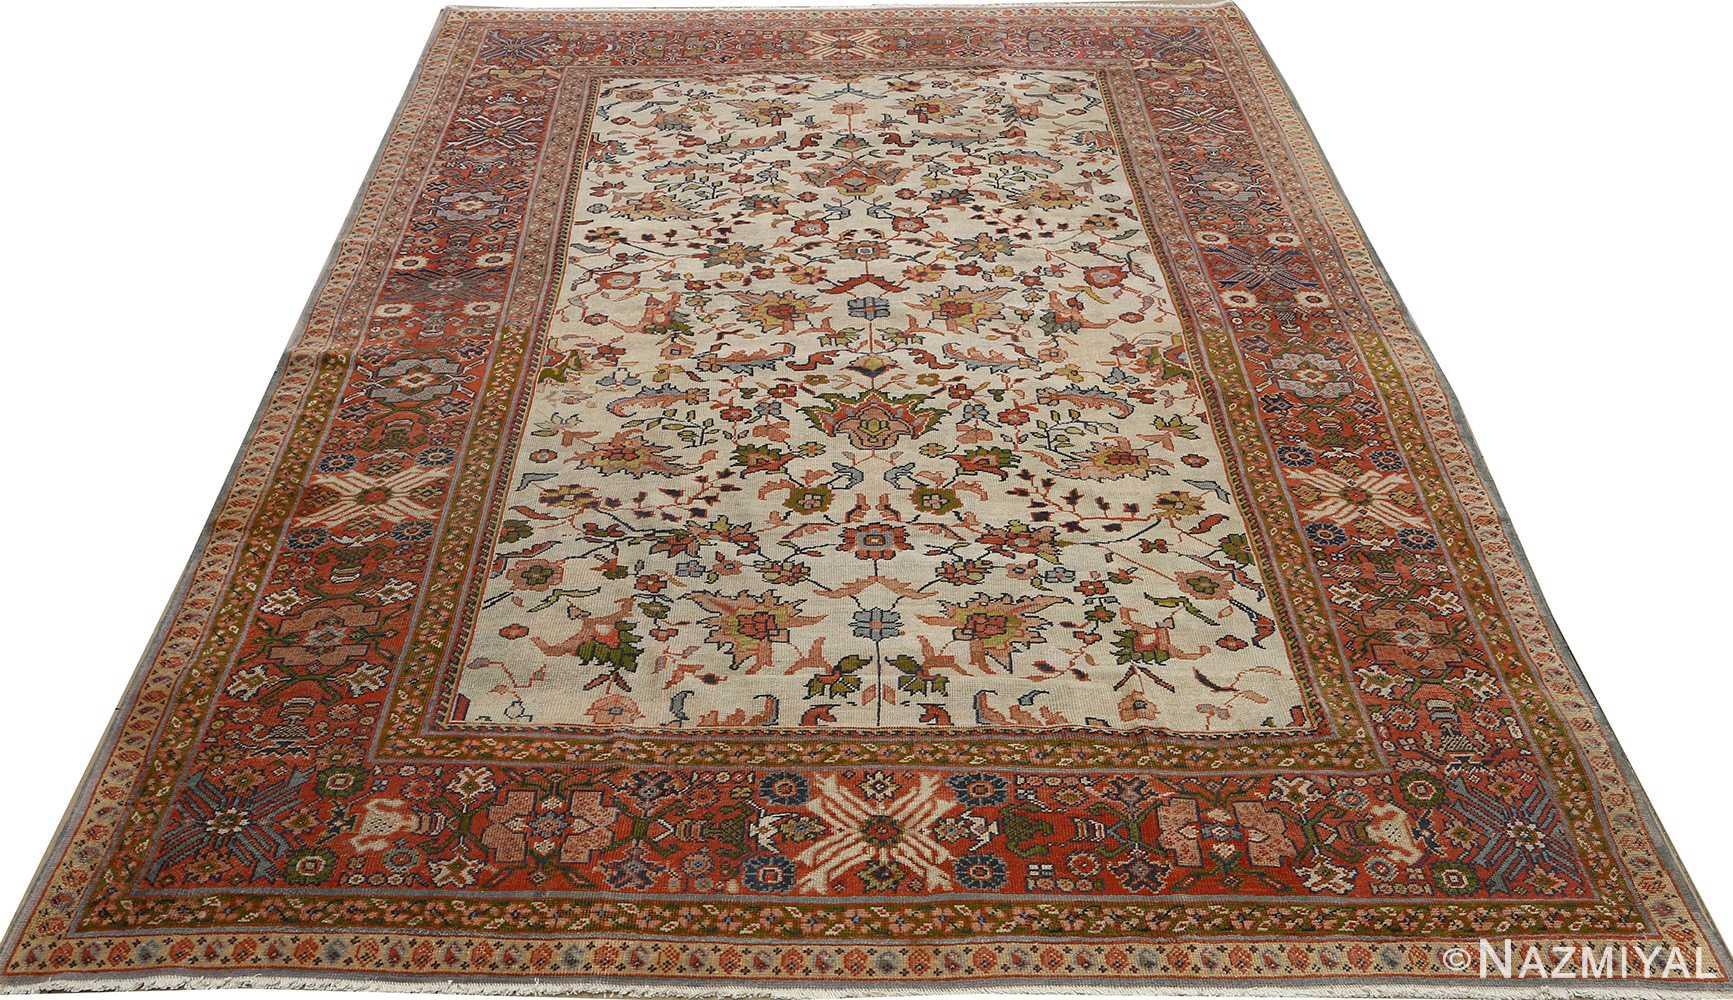 antique ivory background sultanabad persian rug 51101 full Nazmiyal